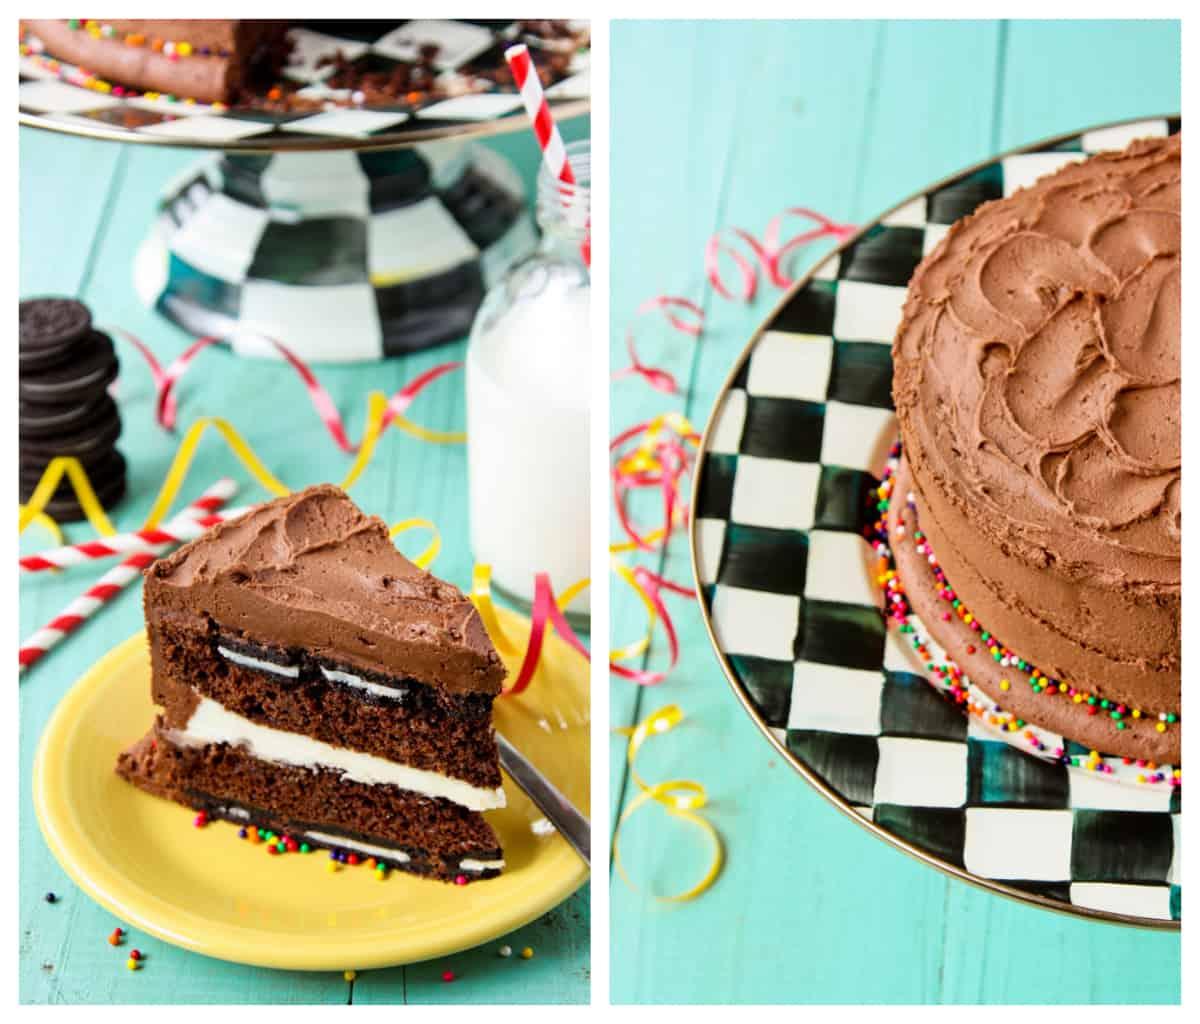 Oreo Surprise-Inside Cake - afarmgirlsdabbles.com